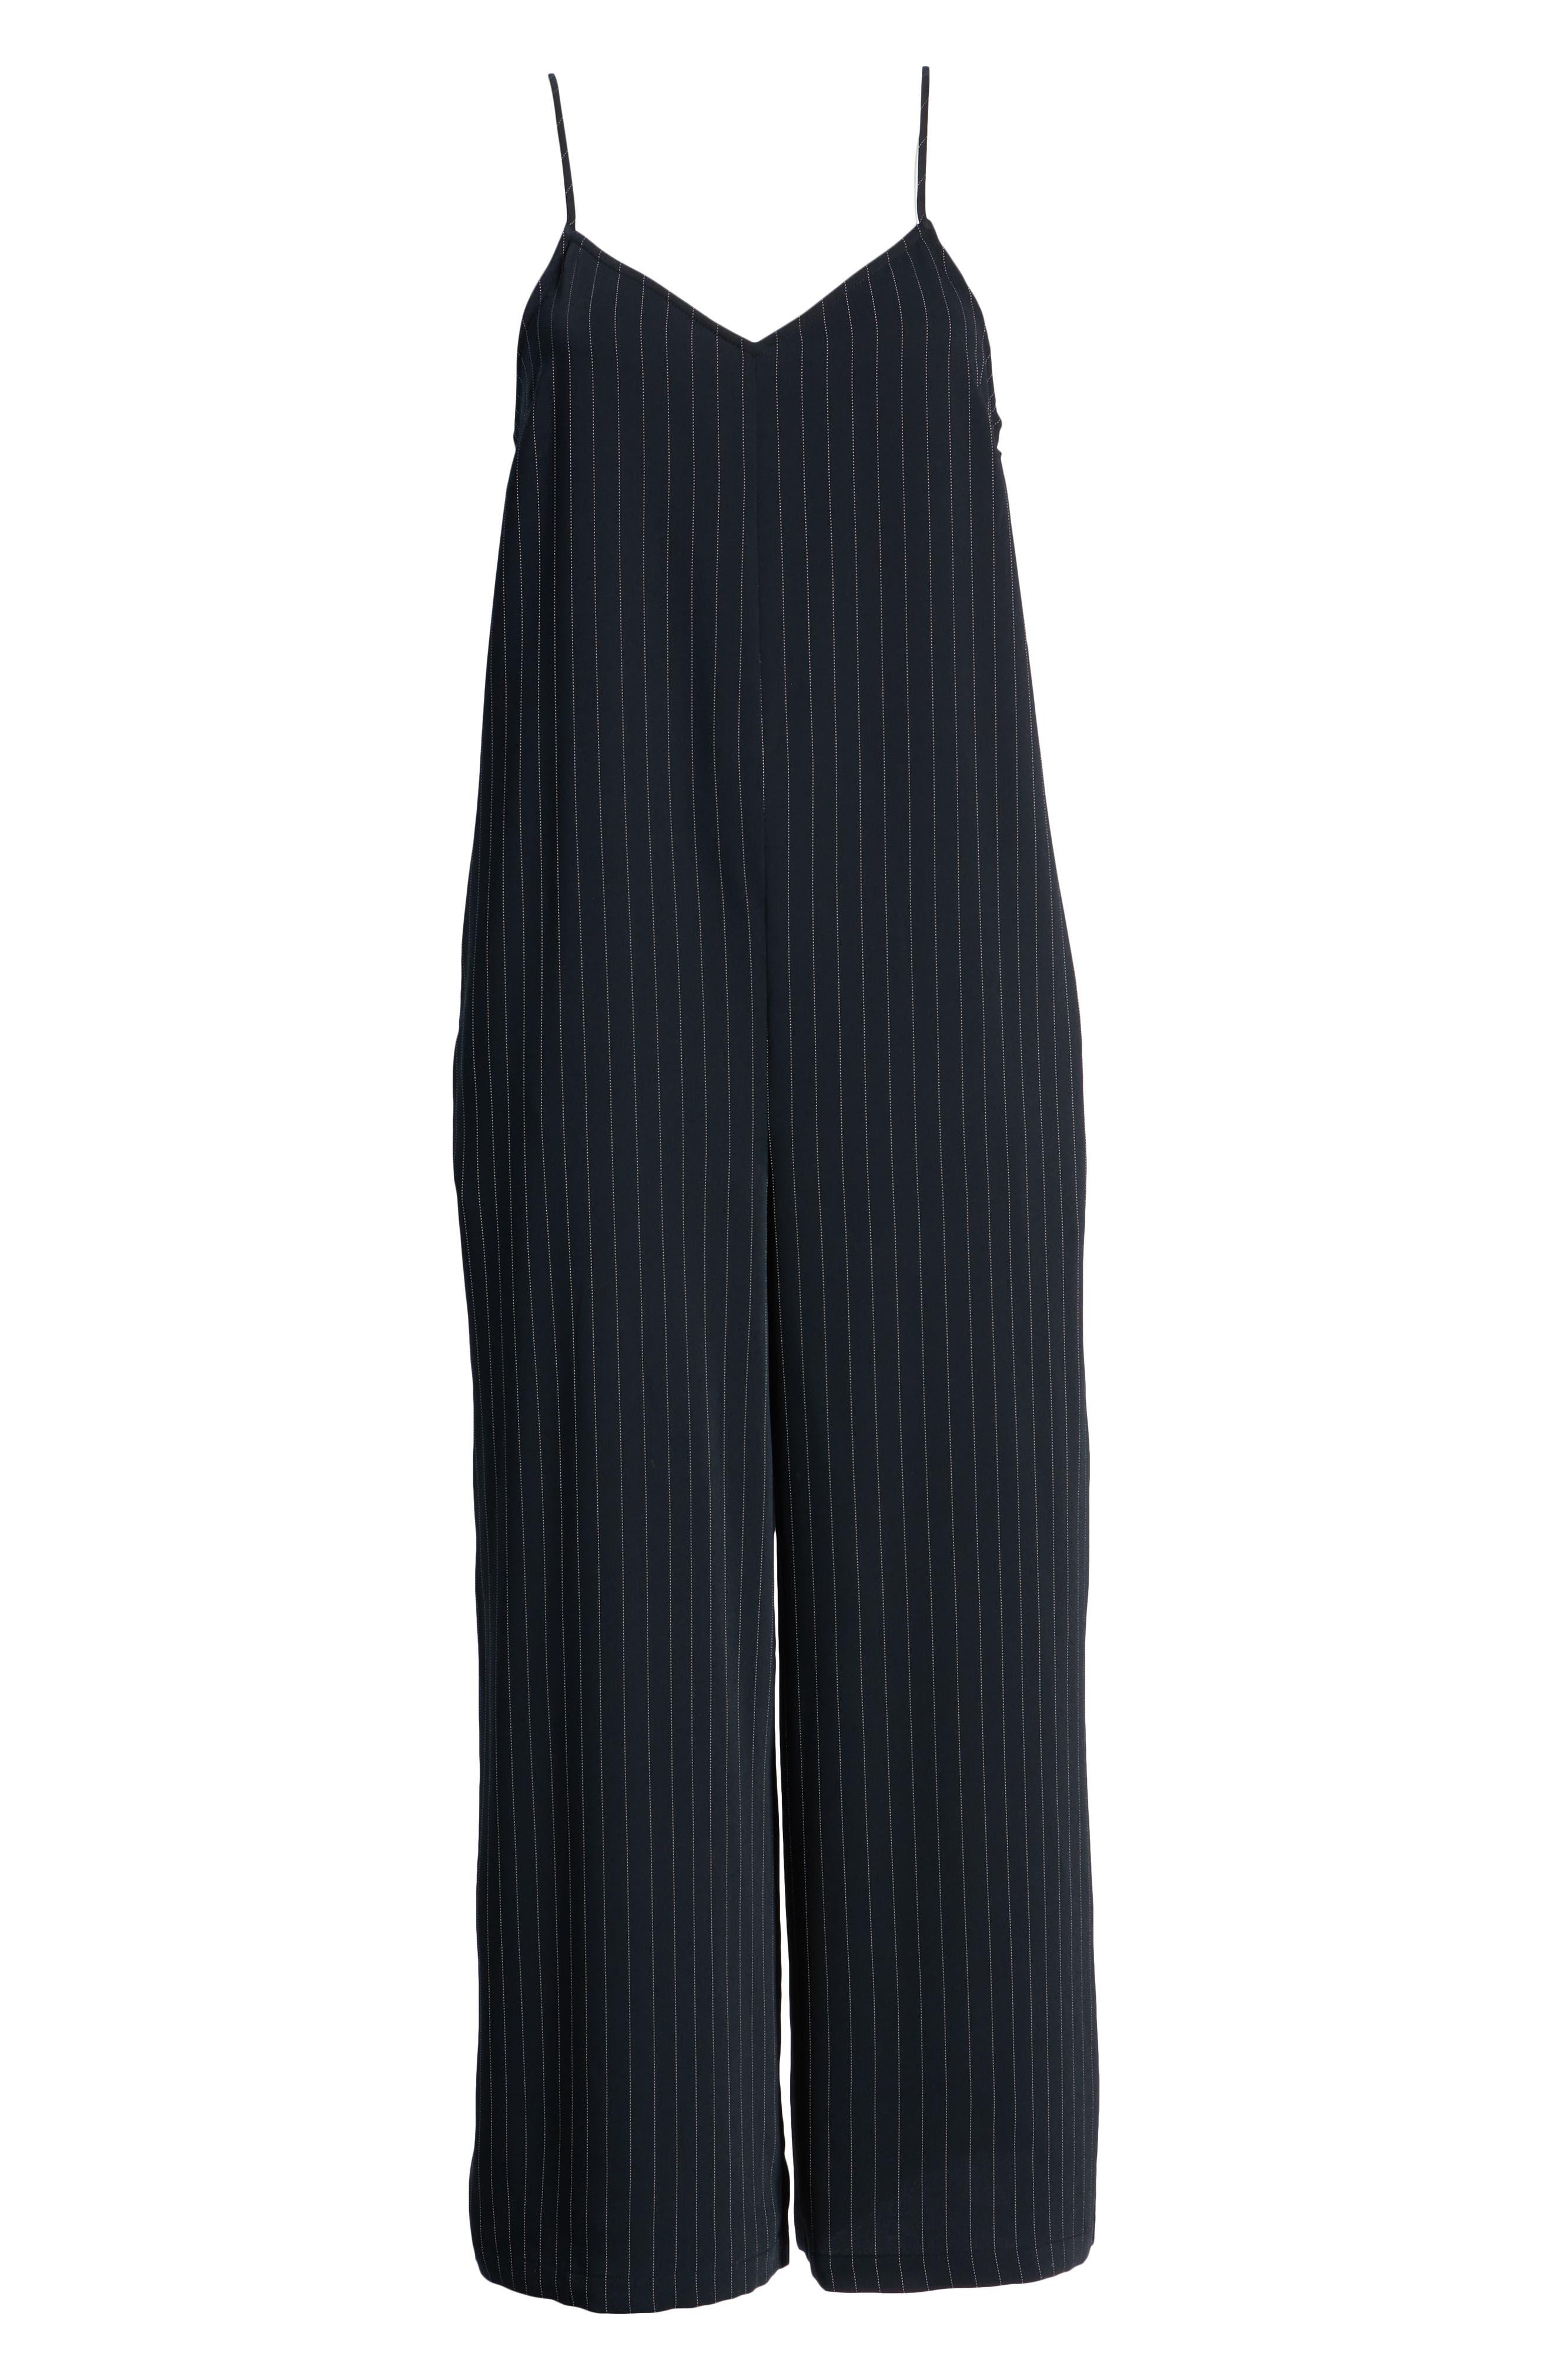 Crop Jumpsuit,                             Alternate thumbnail 7, color,                             BLACK DOTTED PINSTRIPE